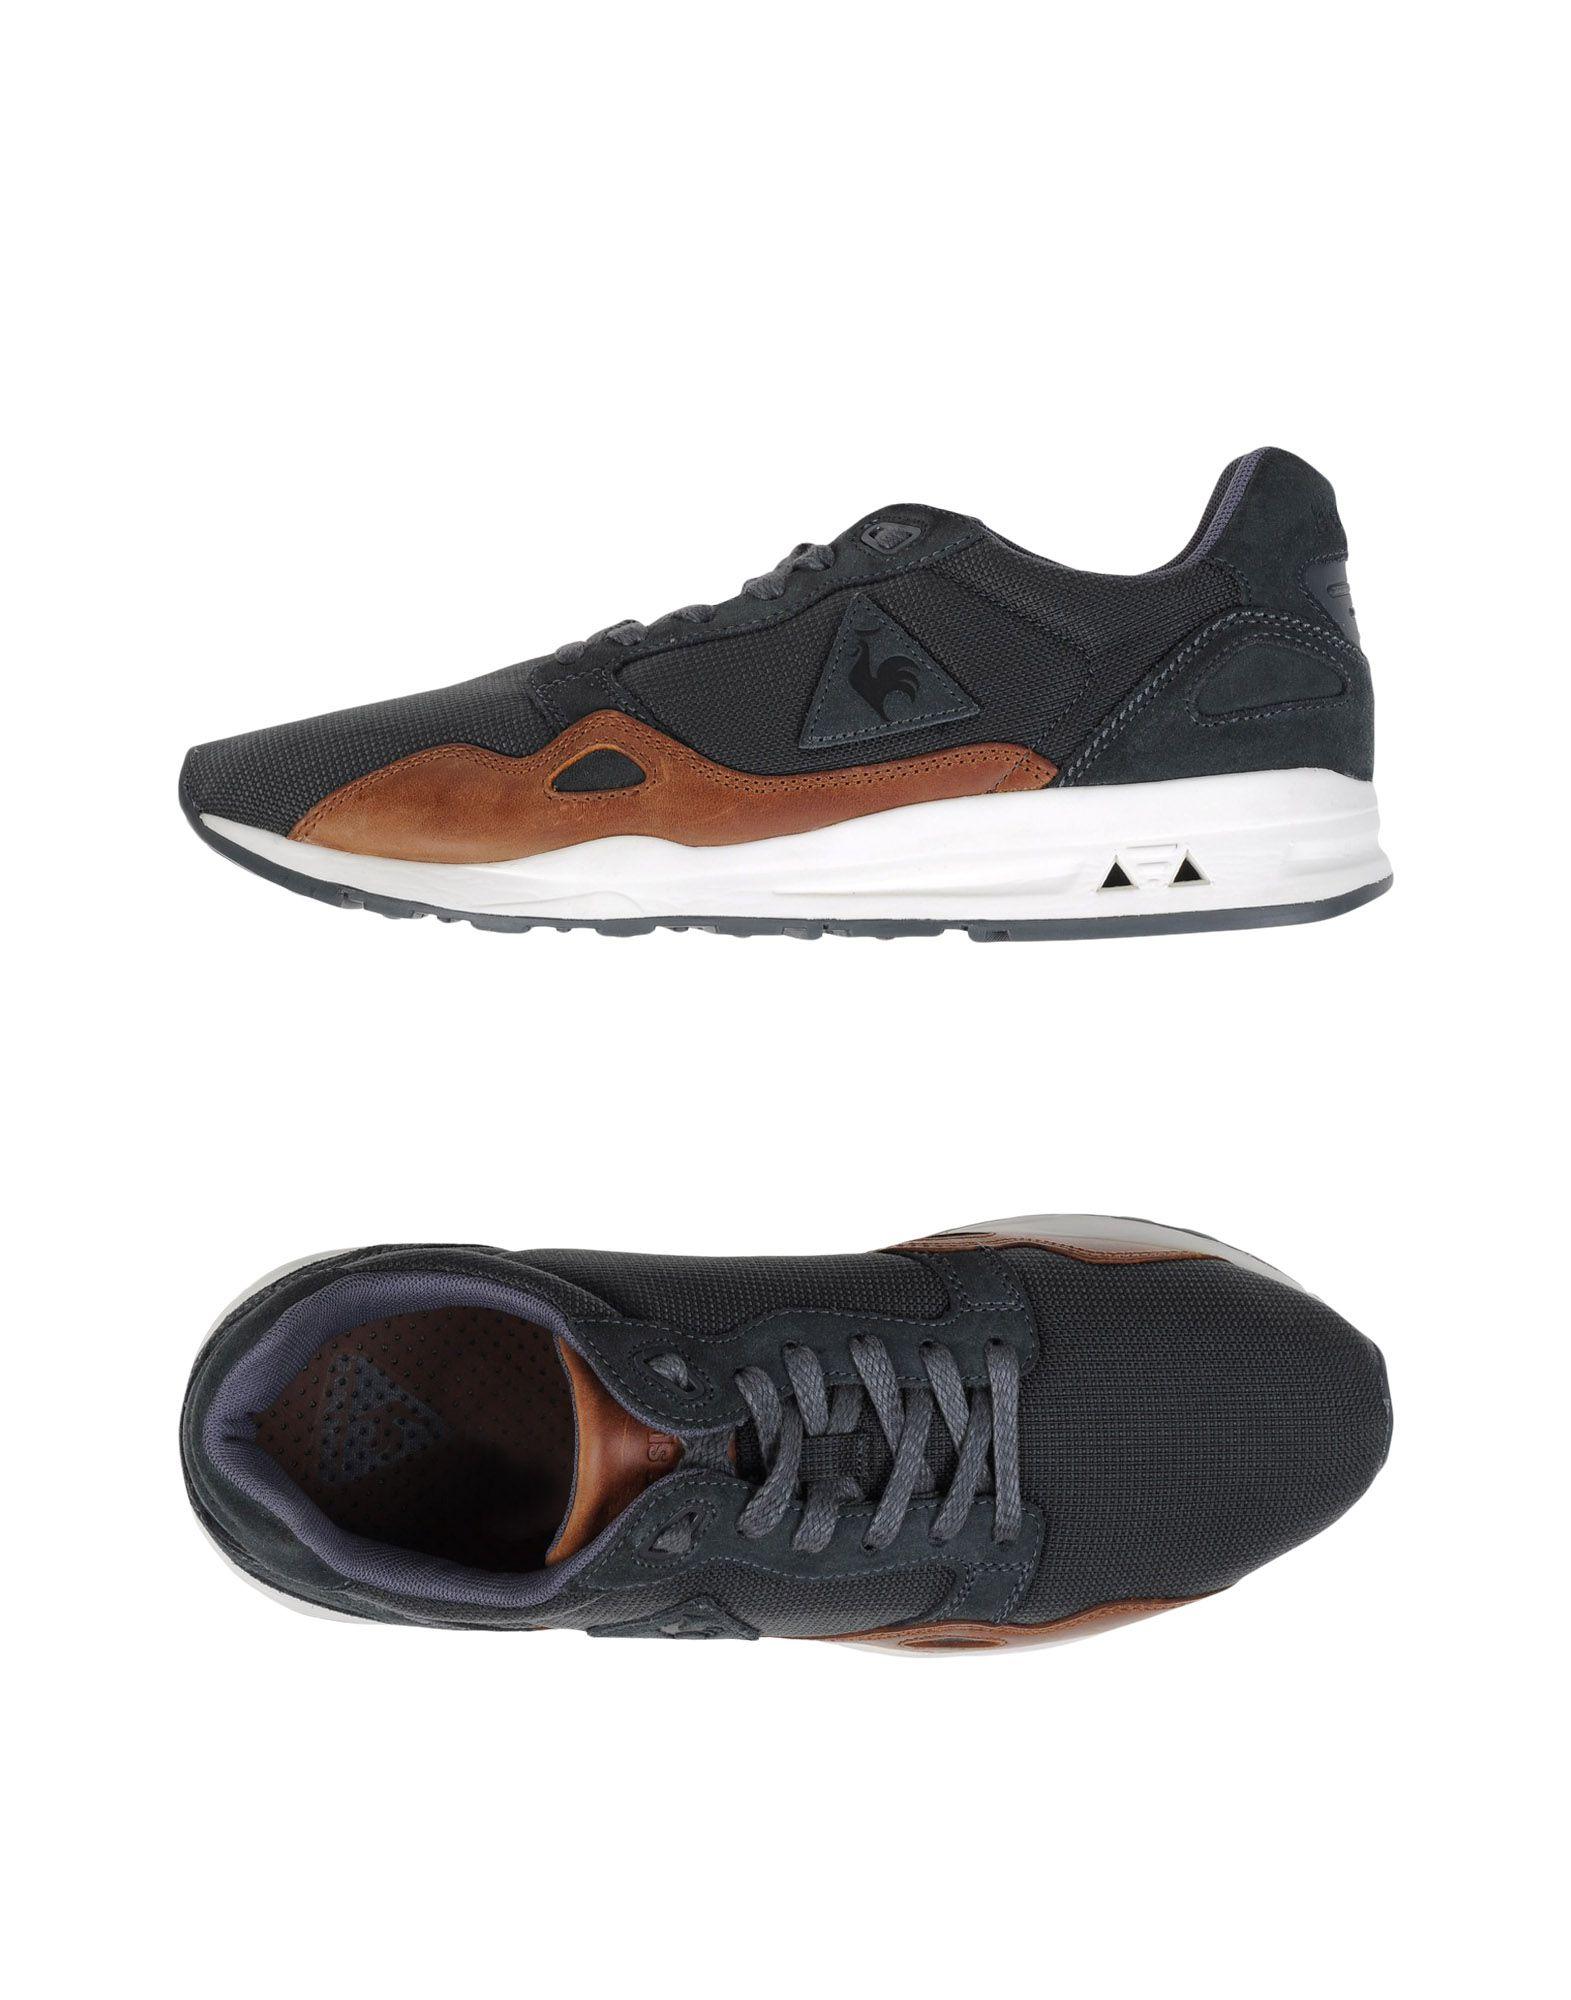 Sneakers Le Coq Sportif Lcs R900 C Cordura - Uomo - 11115911CM